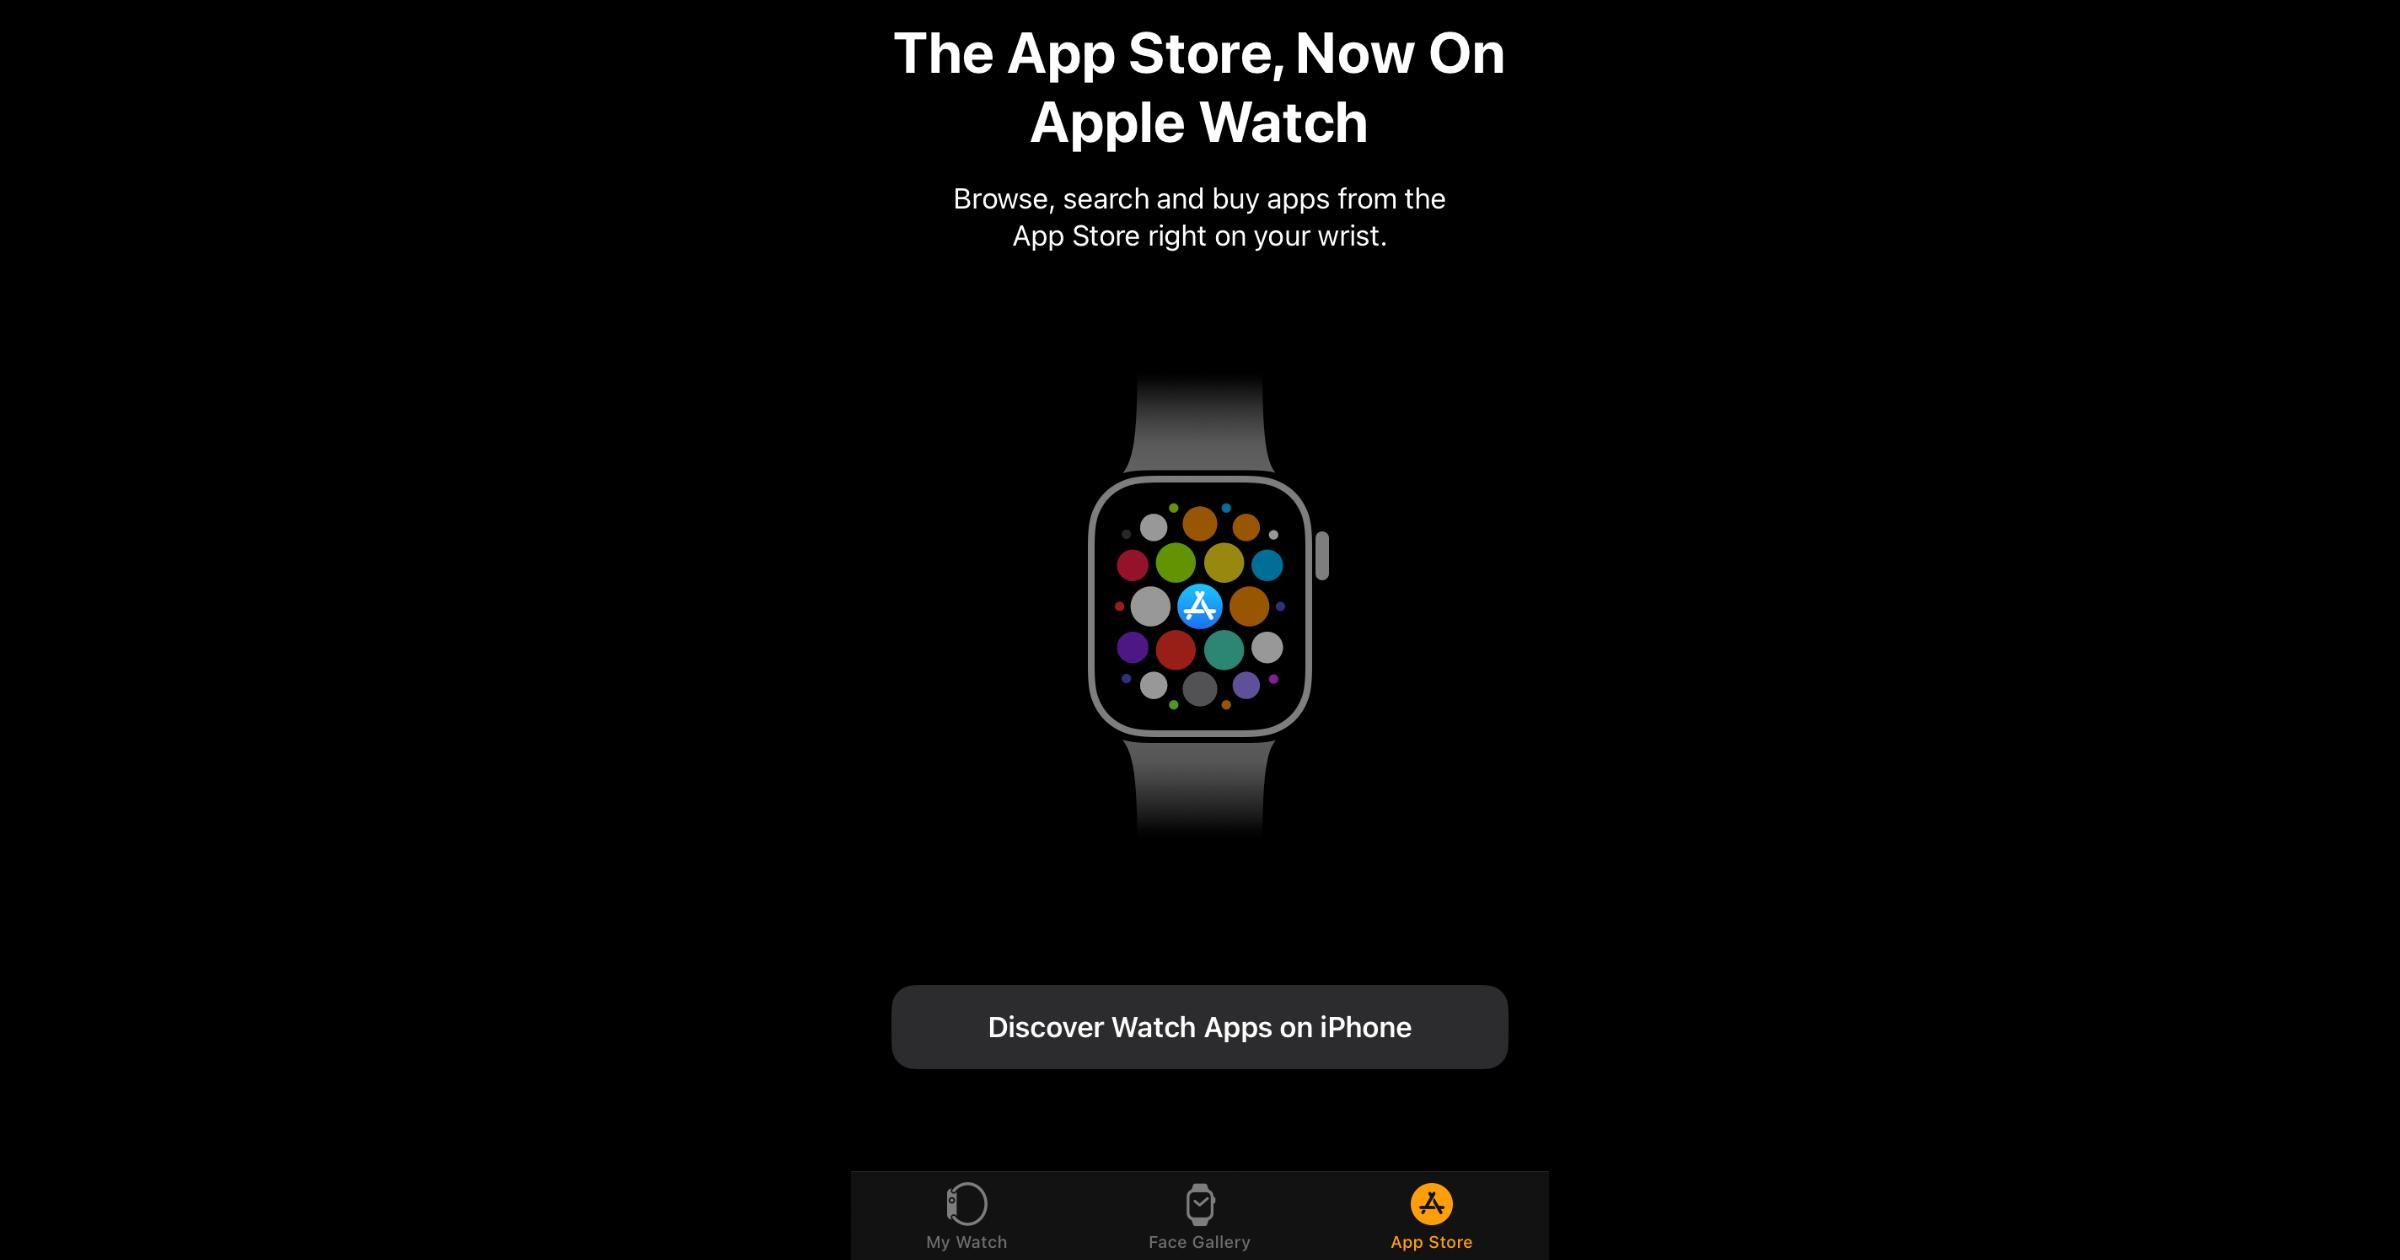 Apple Watch App Store Tab